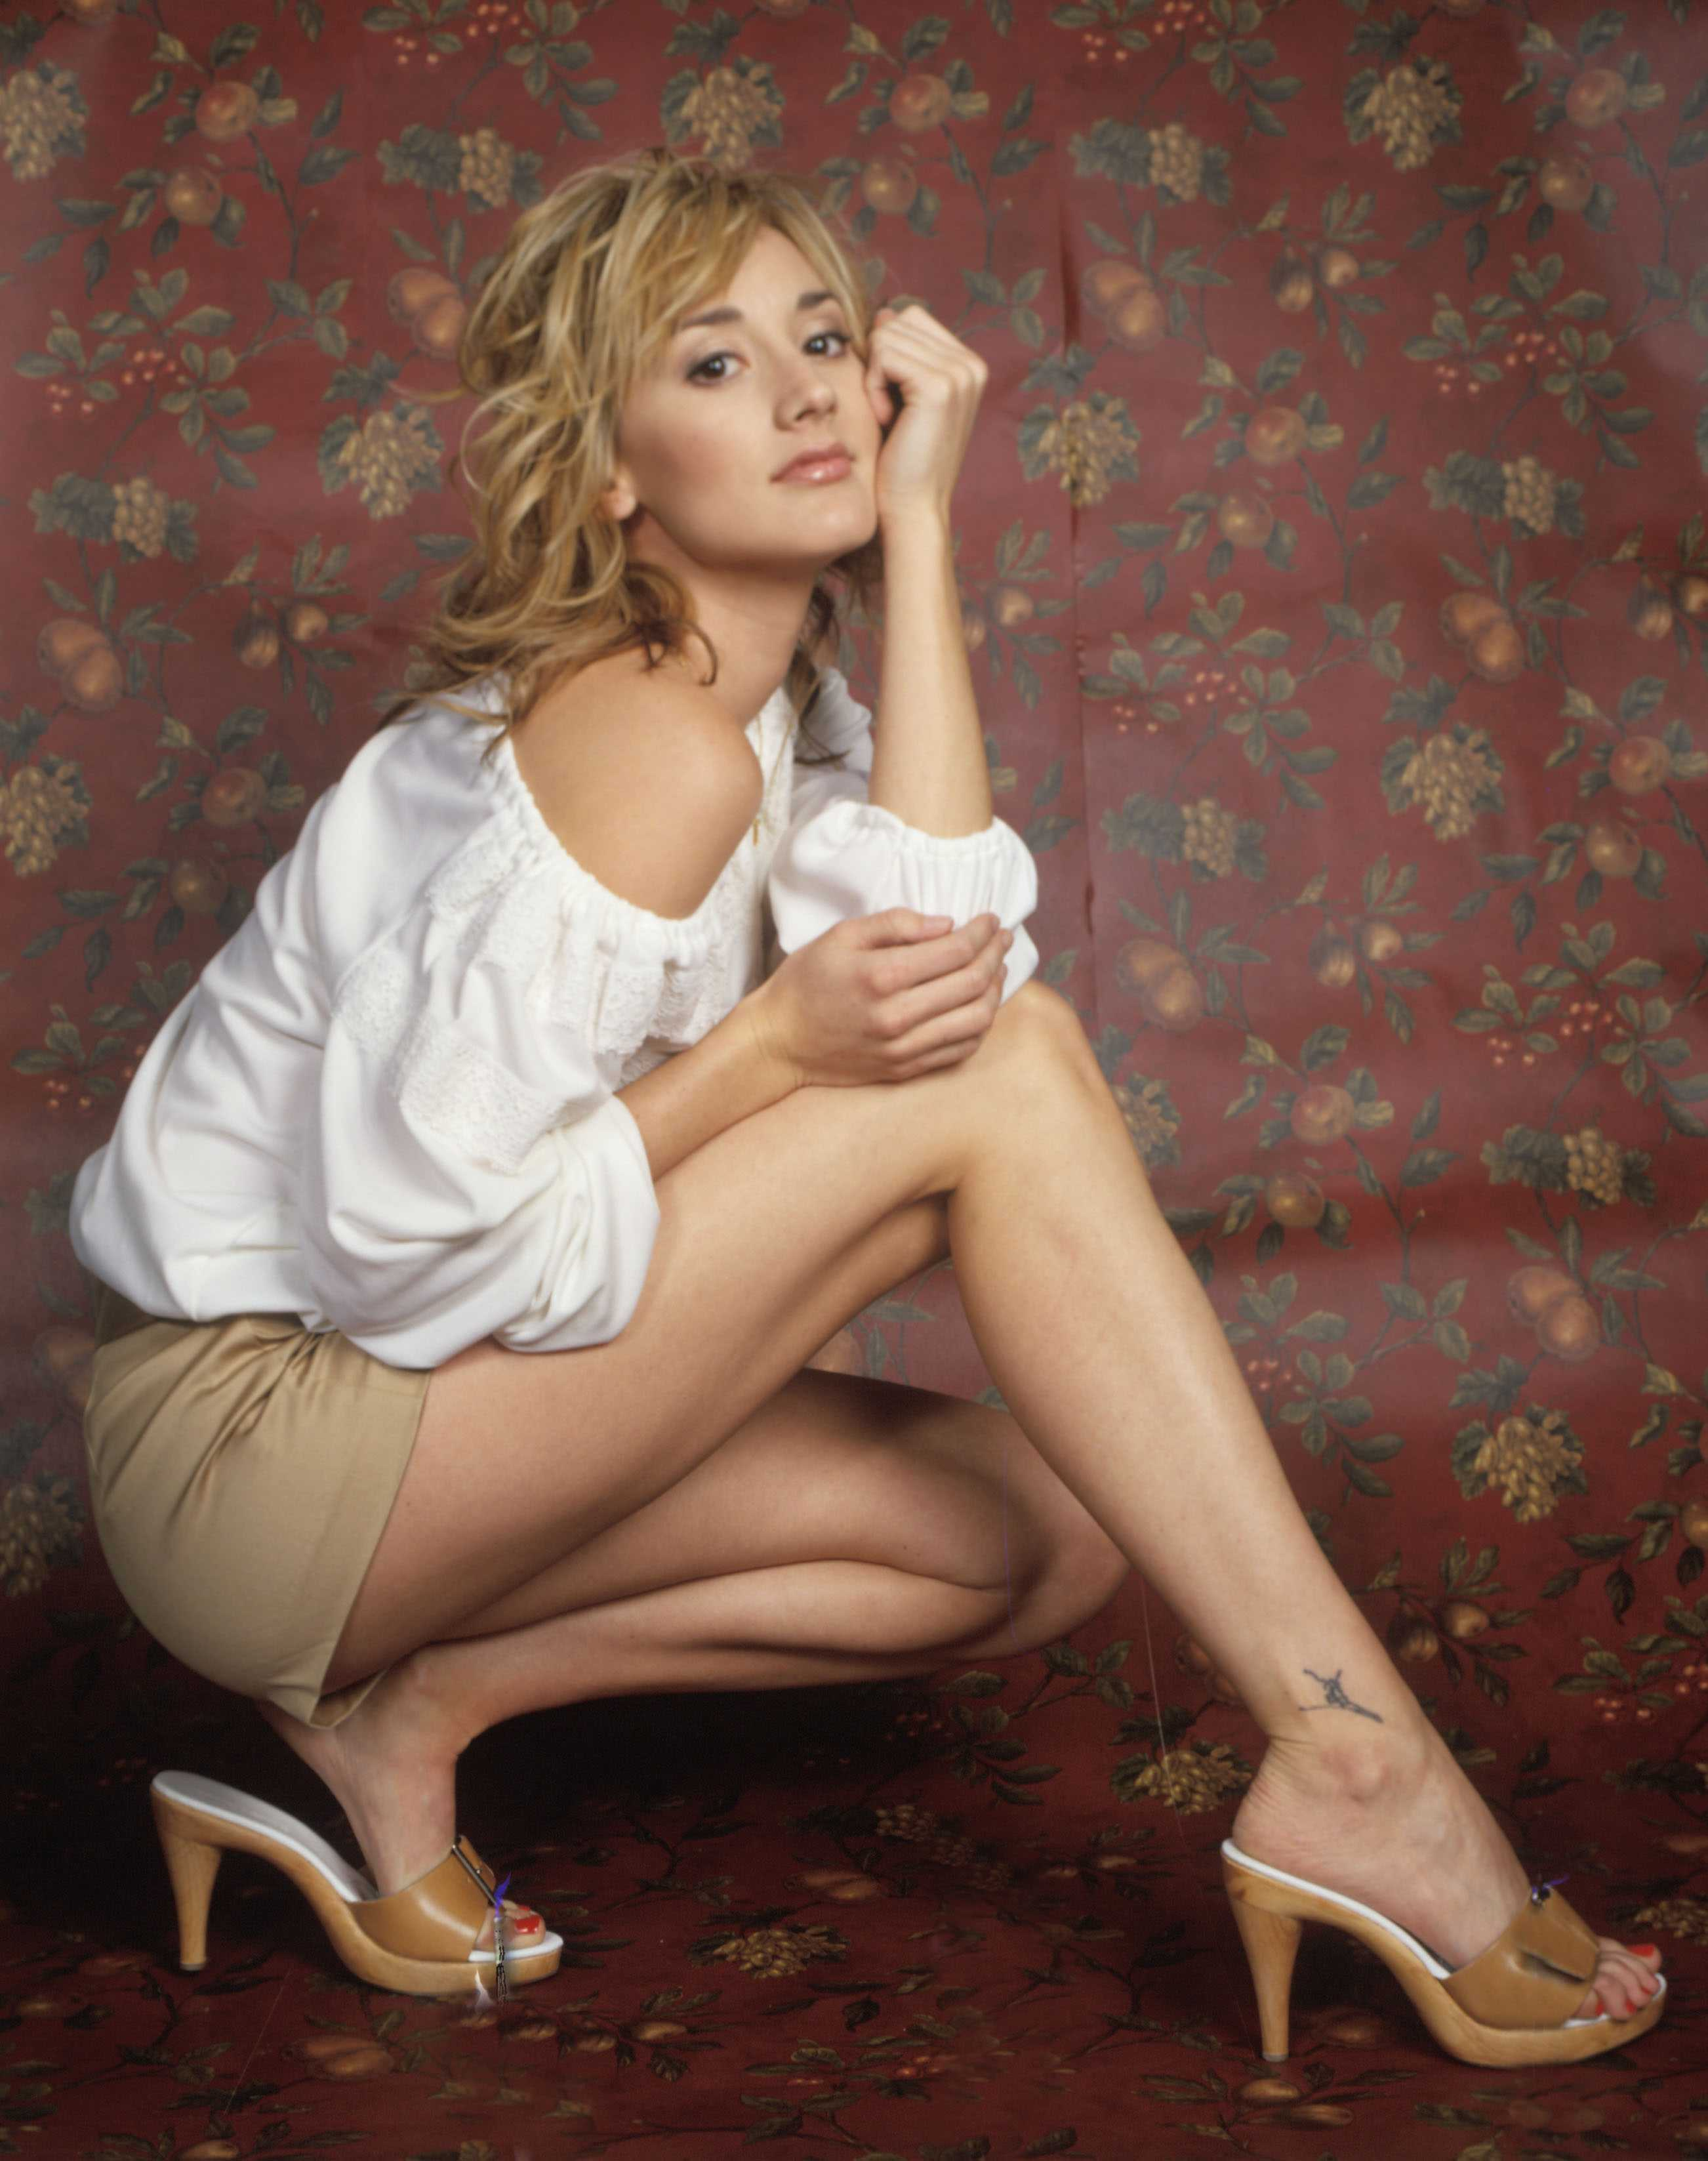 Bree Turner legs hot